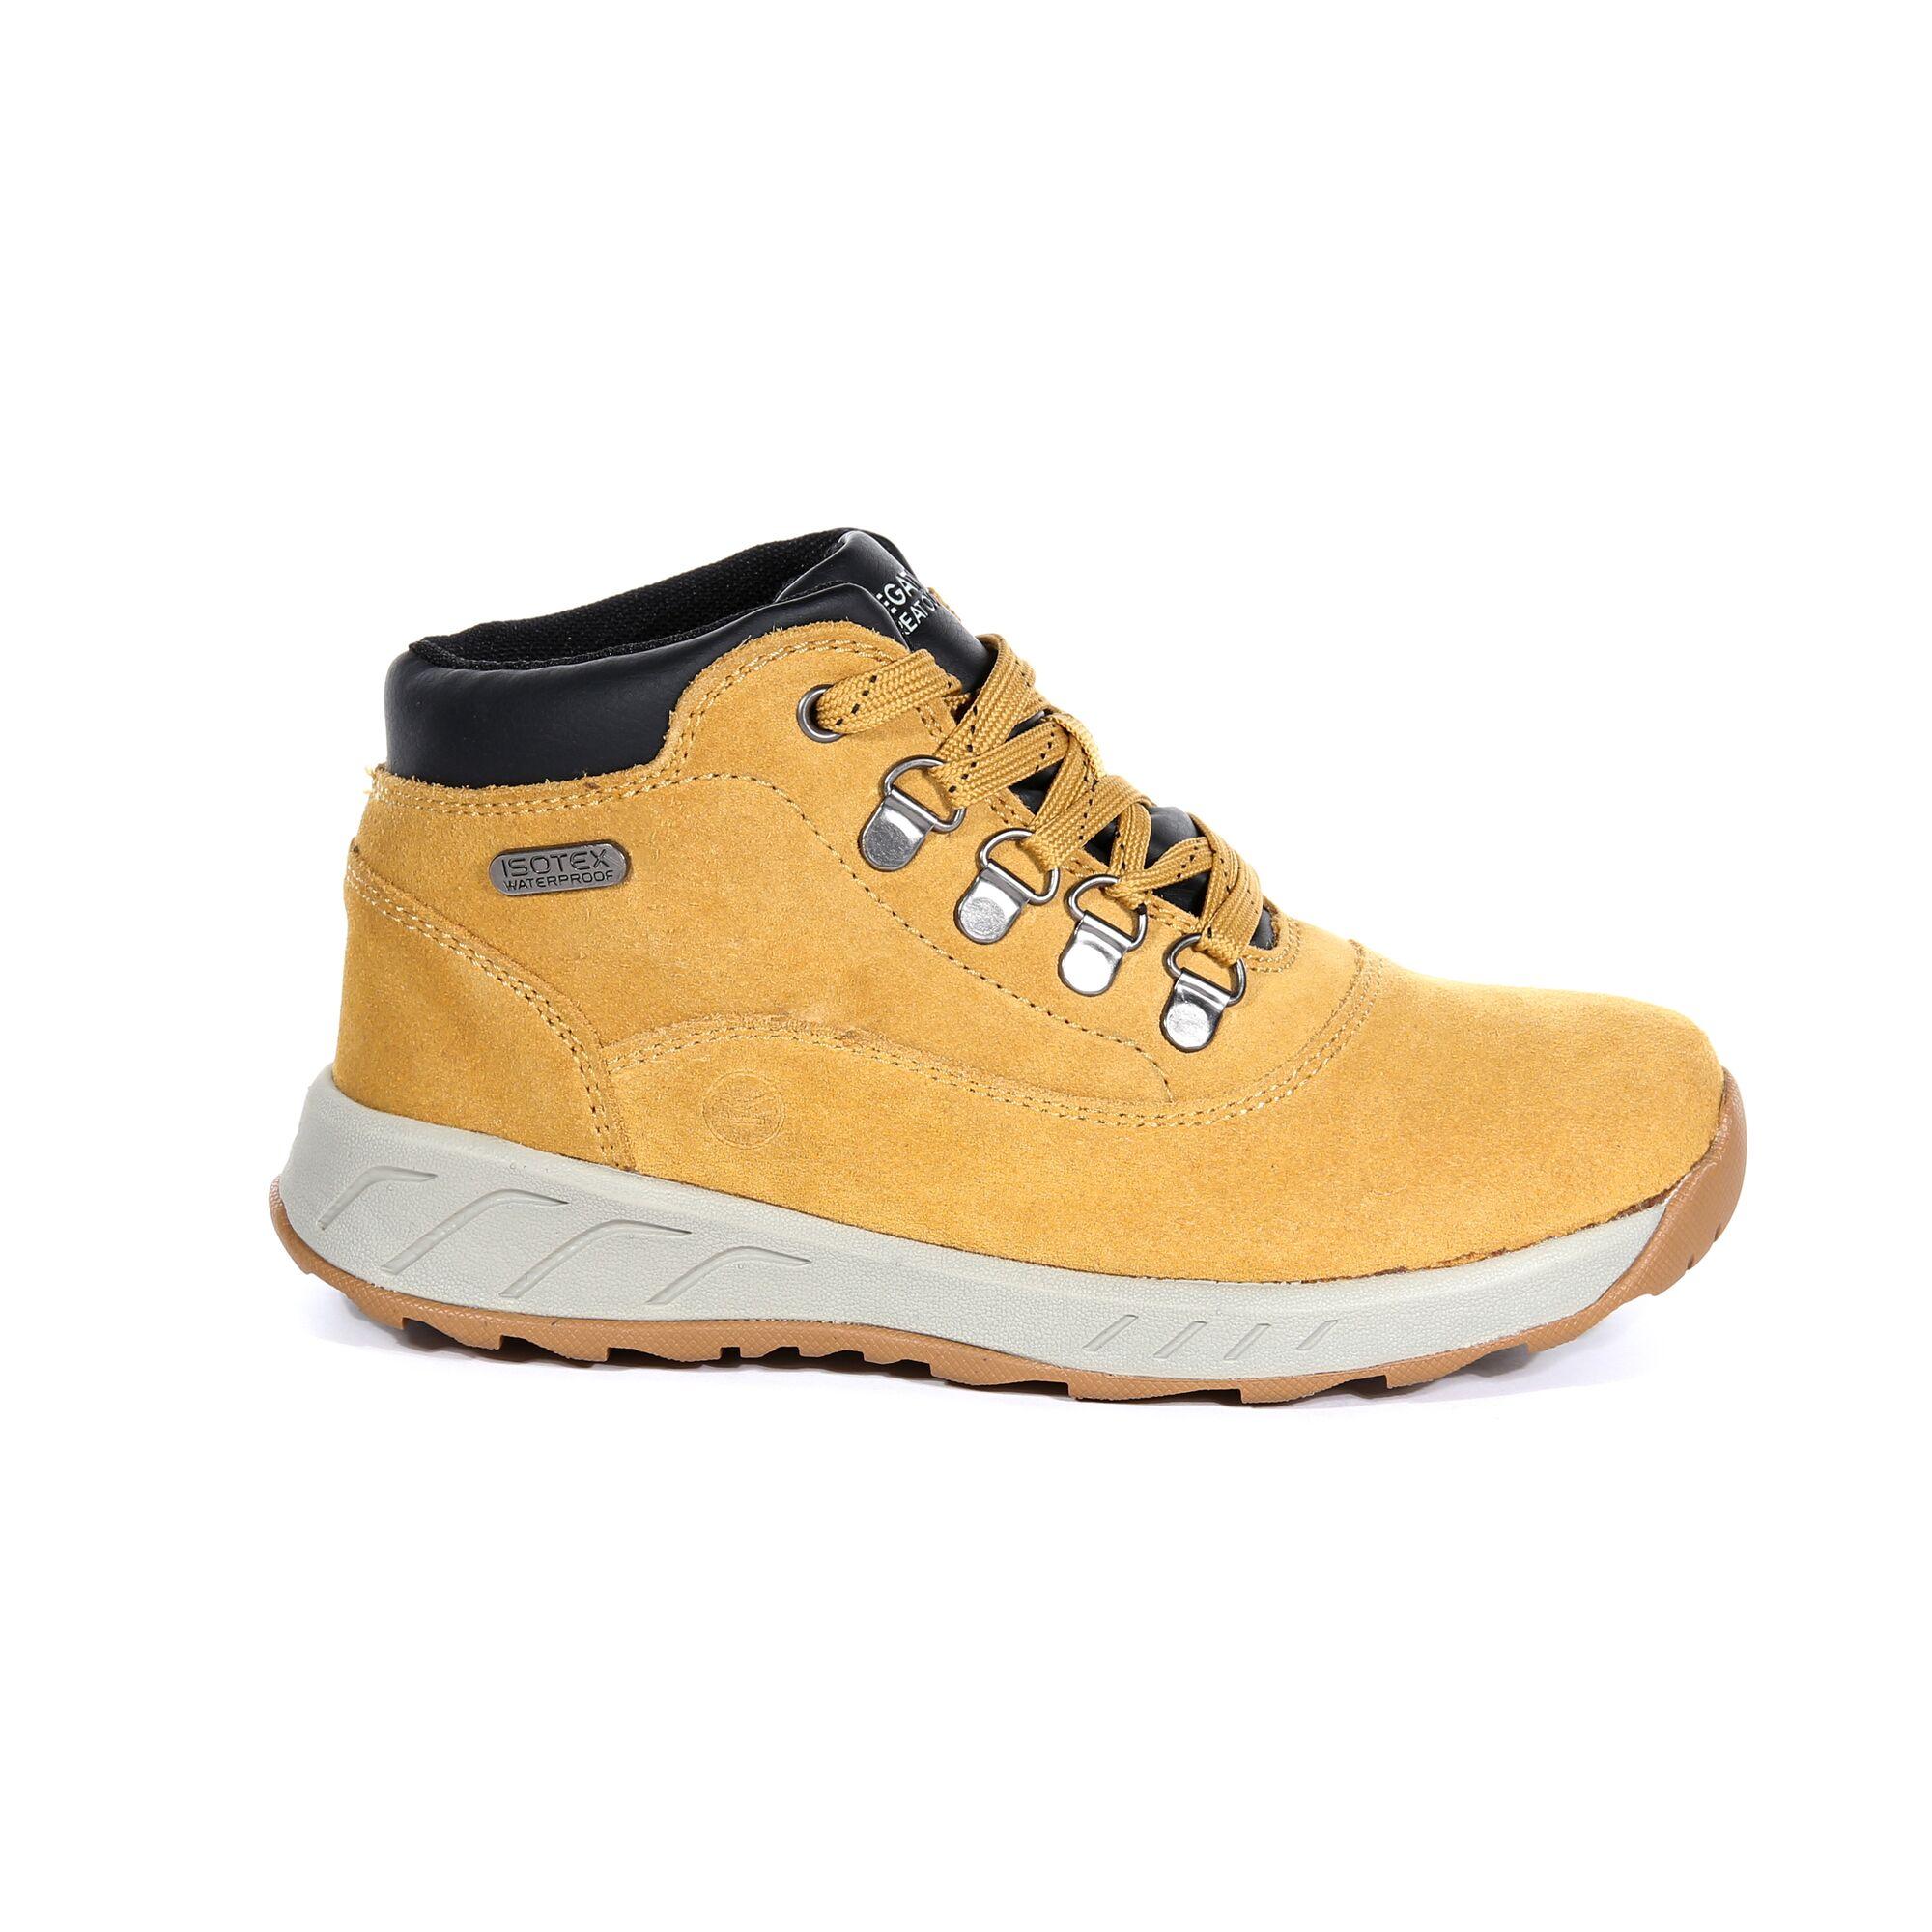 Regatta-Childrens-Kids-Grimshaw-Suede-Walking-Boots-RG3053 thumbnail 8